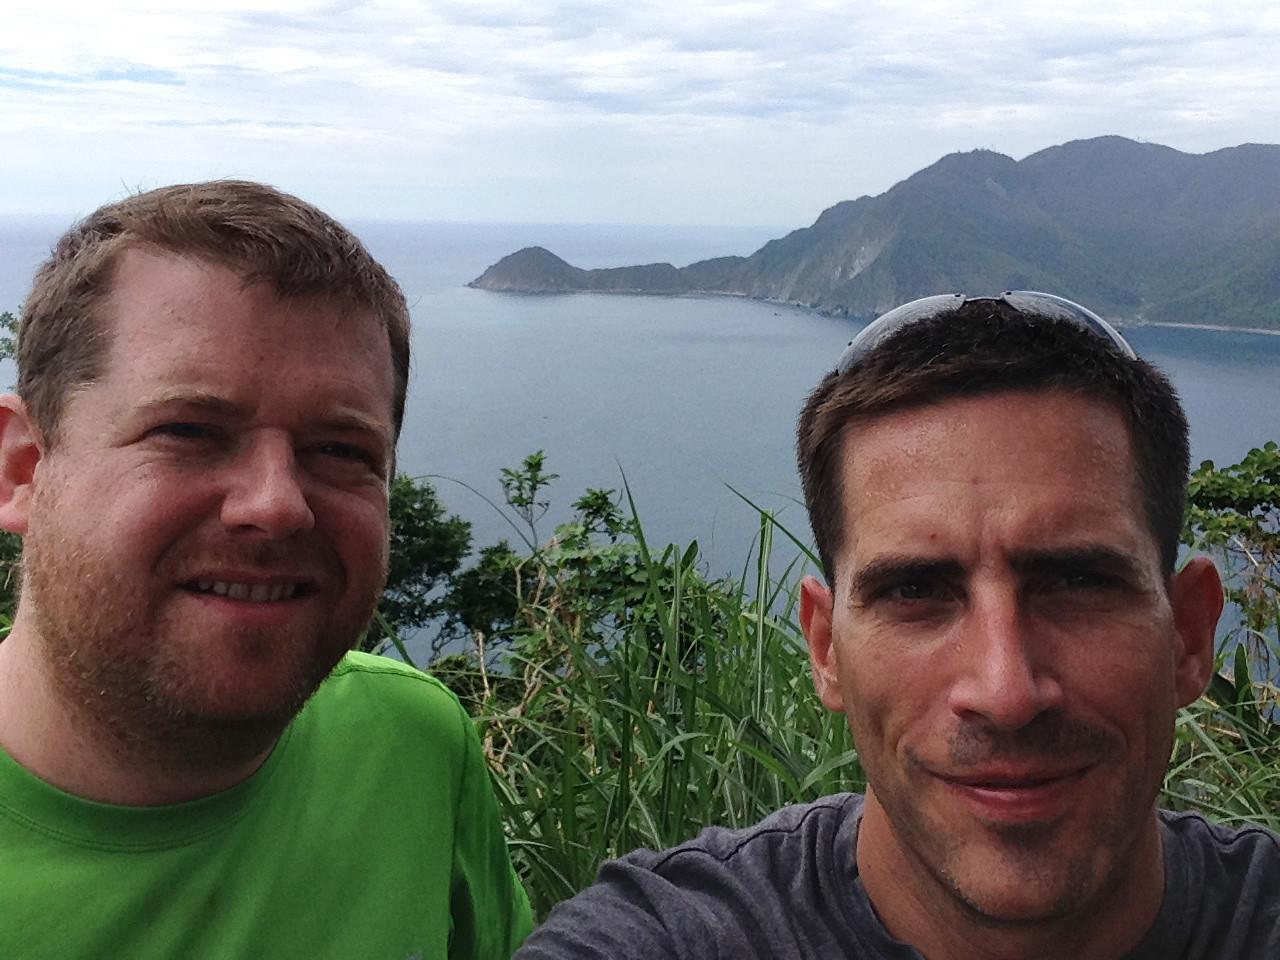 On our way to Taroko Gorge from Taipei, in Taiwan.